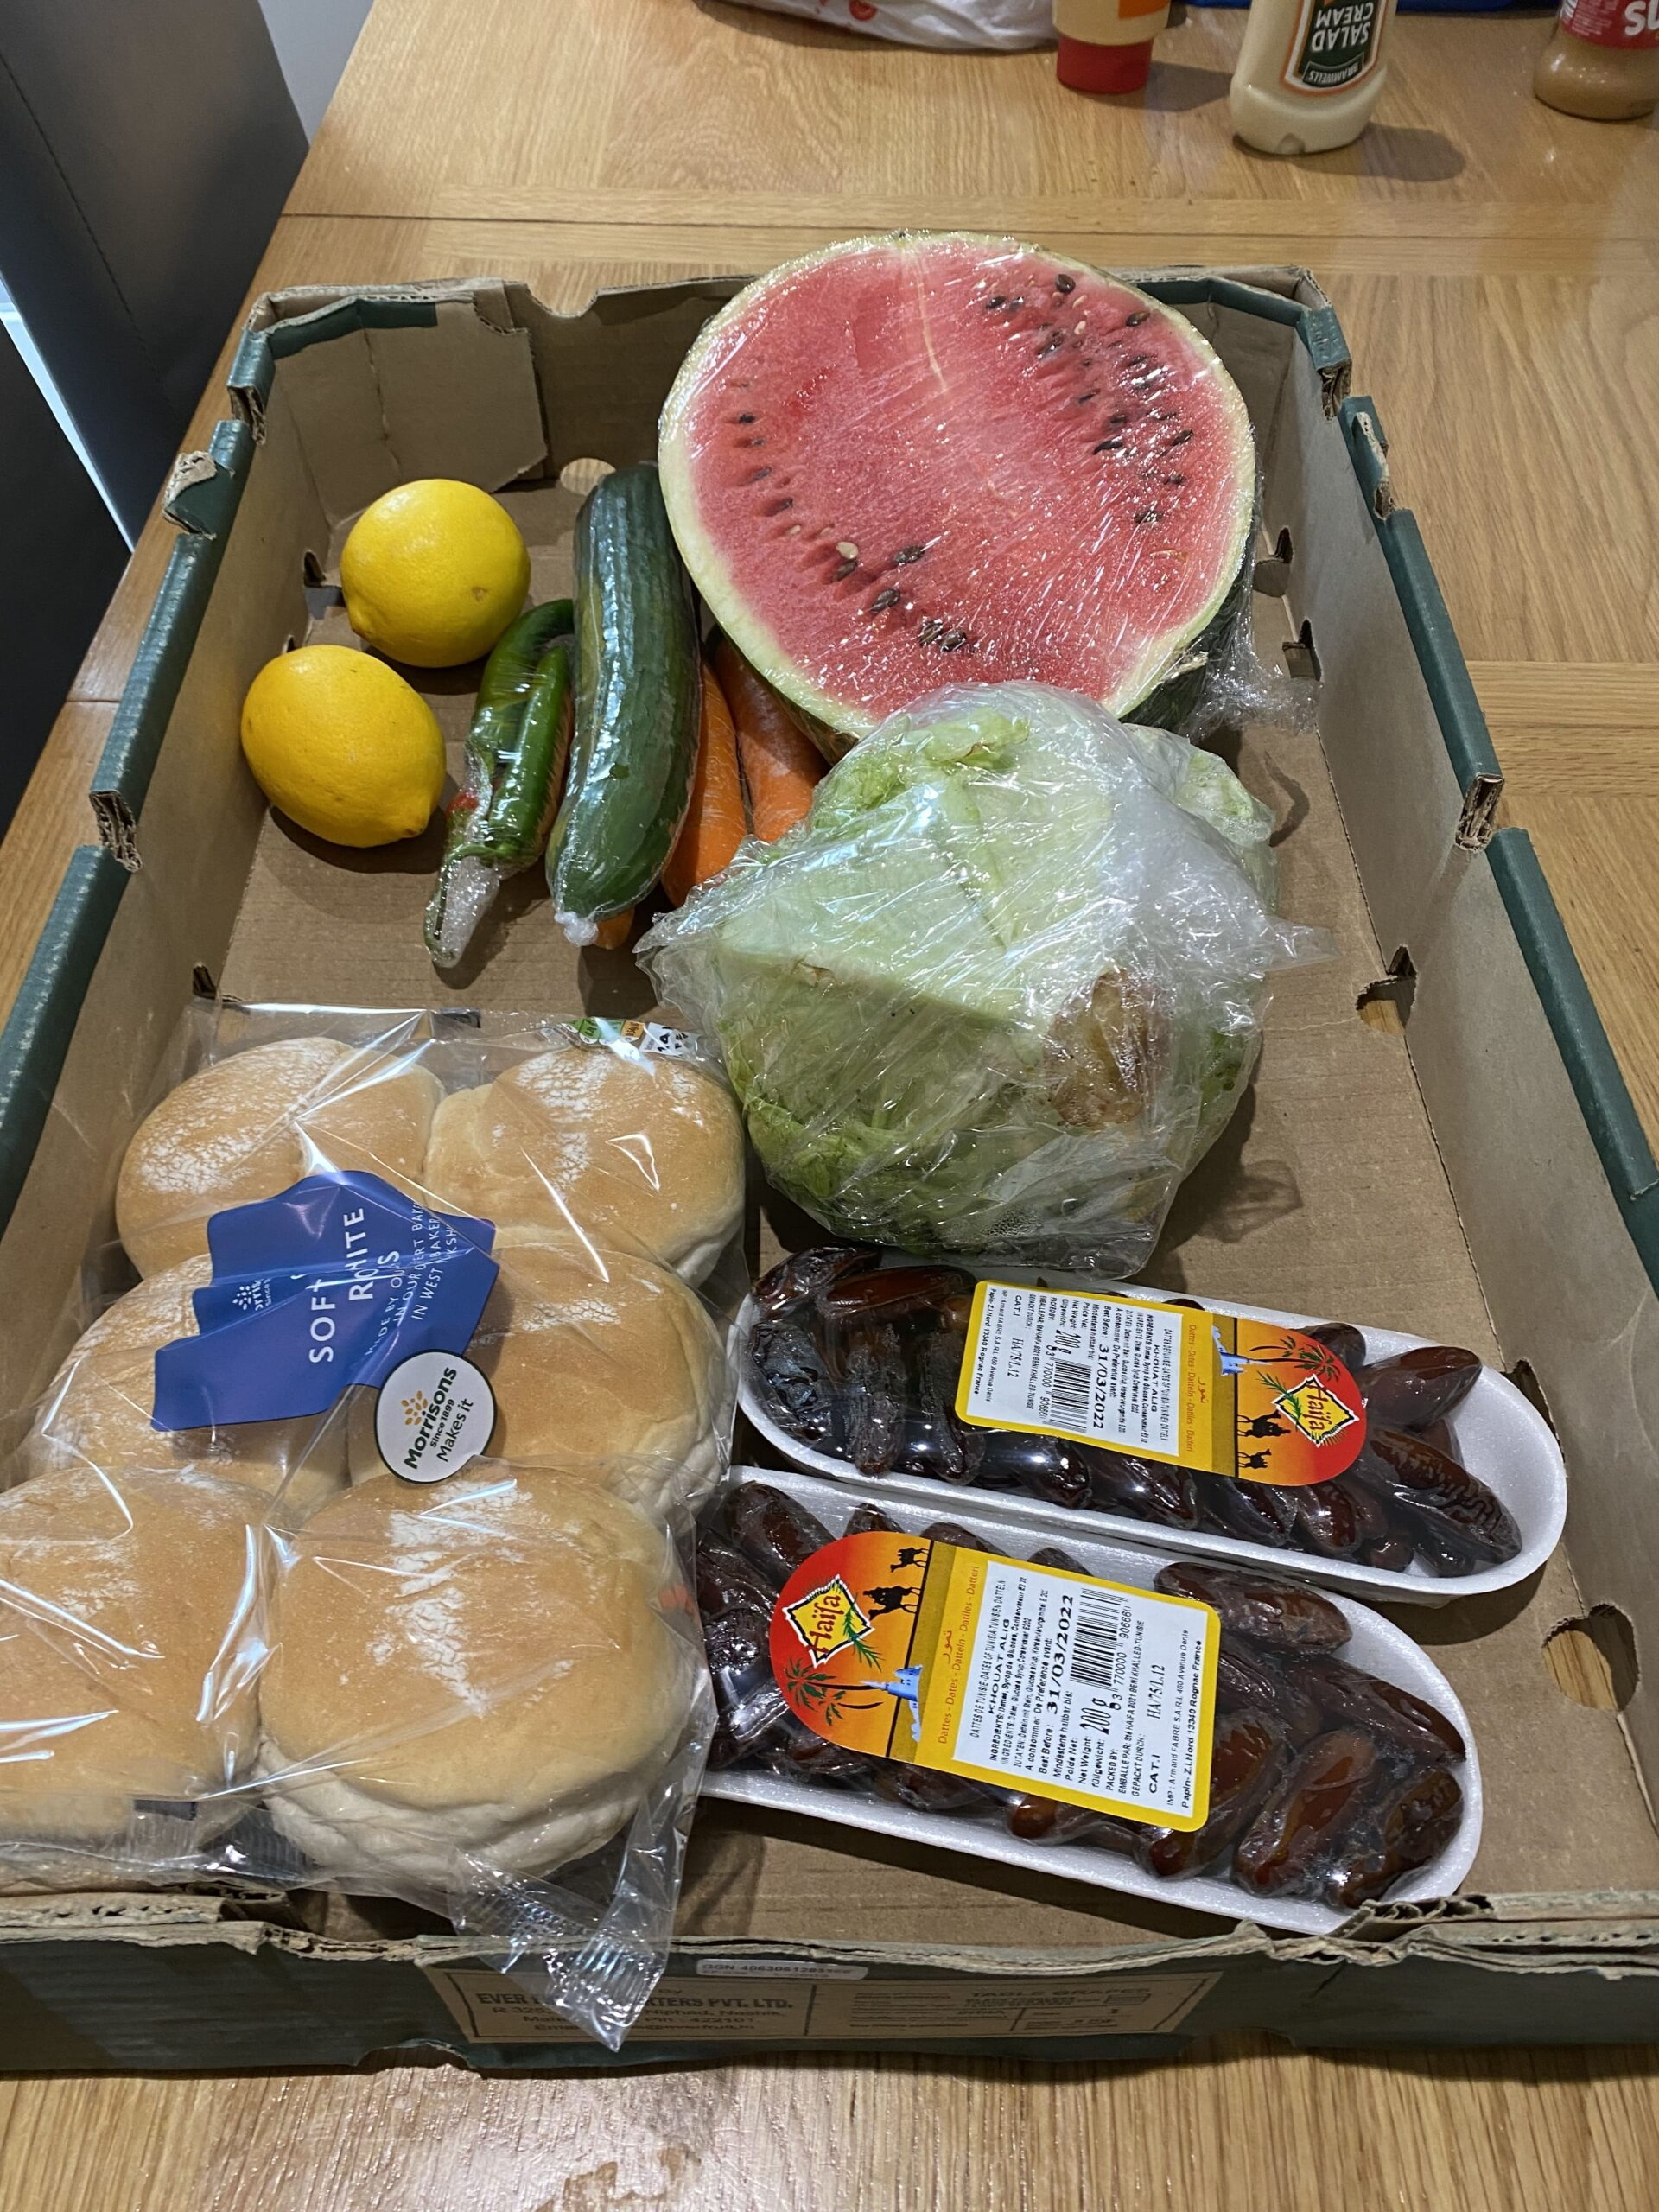 Ingredients for Eid meal